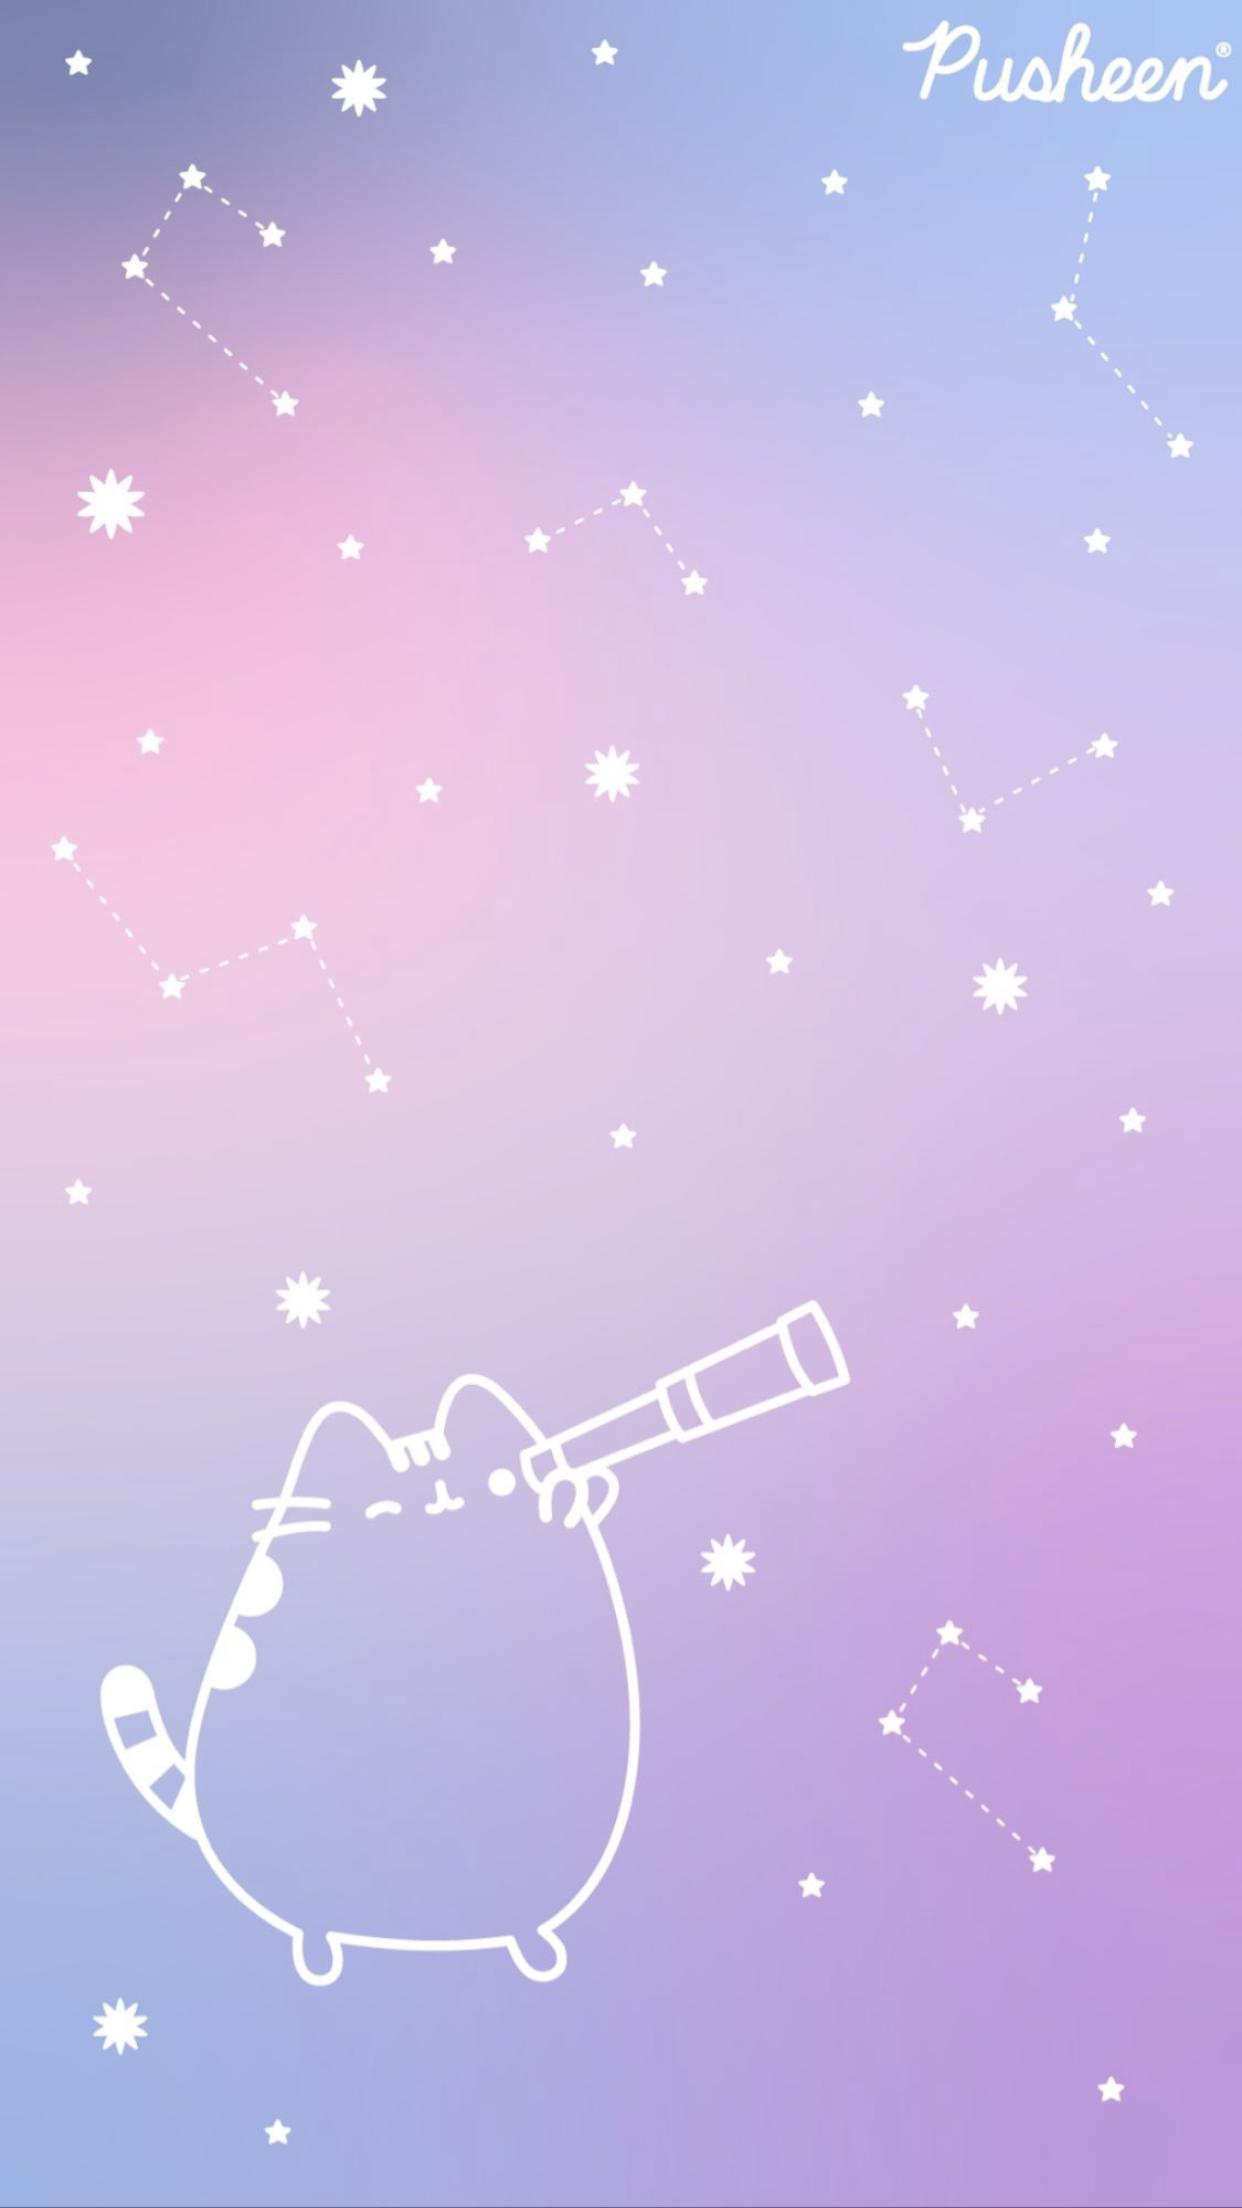 Pusheen the cat iphone wallpaper astronomy constellations -   - #allergictocats #astronomy #Cat #catcat #cathouse #cattattoo #catwallpaper #catsandkittens #constellations #crazycats #dogcat #gatosaesthetic #Gatosanime #Gatosartesanato #gatoscats #Gatosdibujos #Gatosmanualidades #gatosmemes #gatostattoo #gatosvideos #iphone #petscats #pusheen #tudosobreGatos #wallpaper